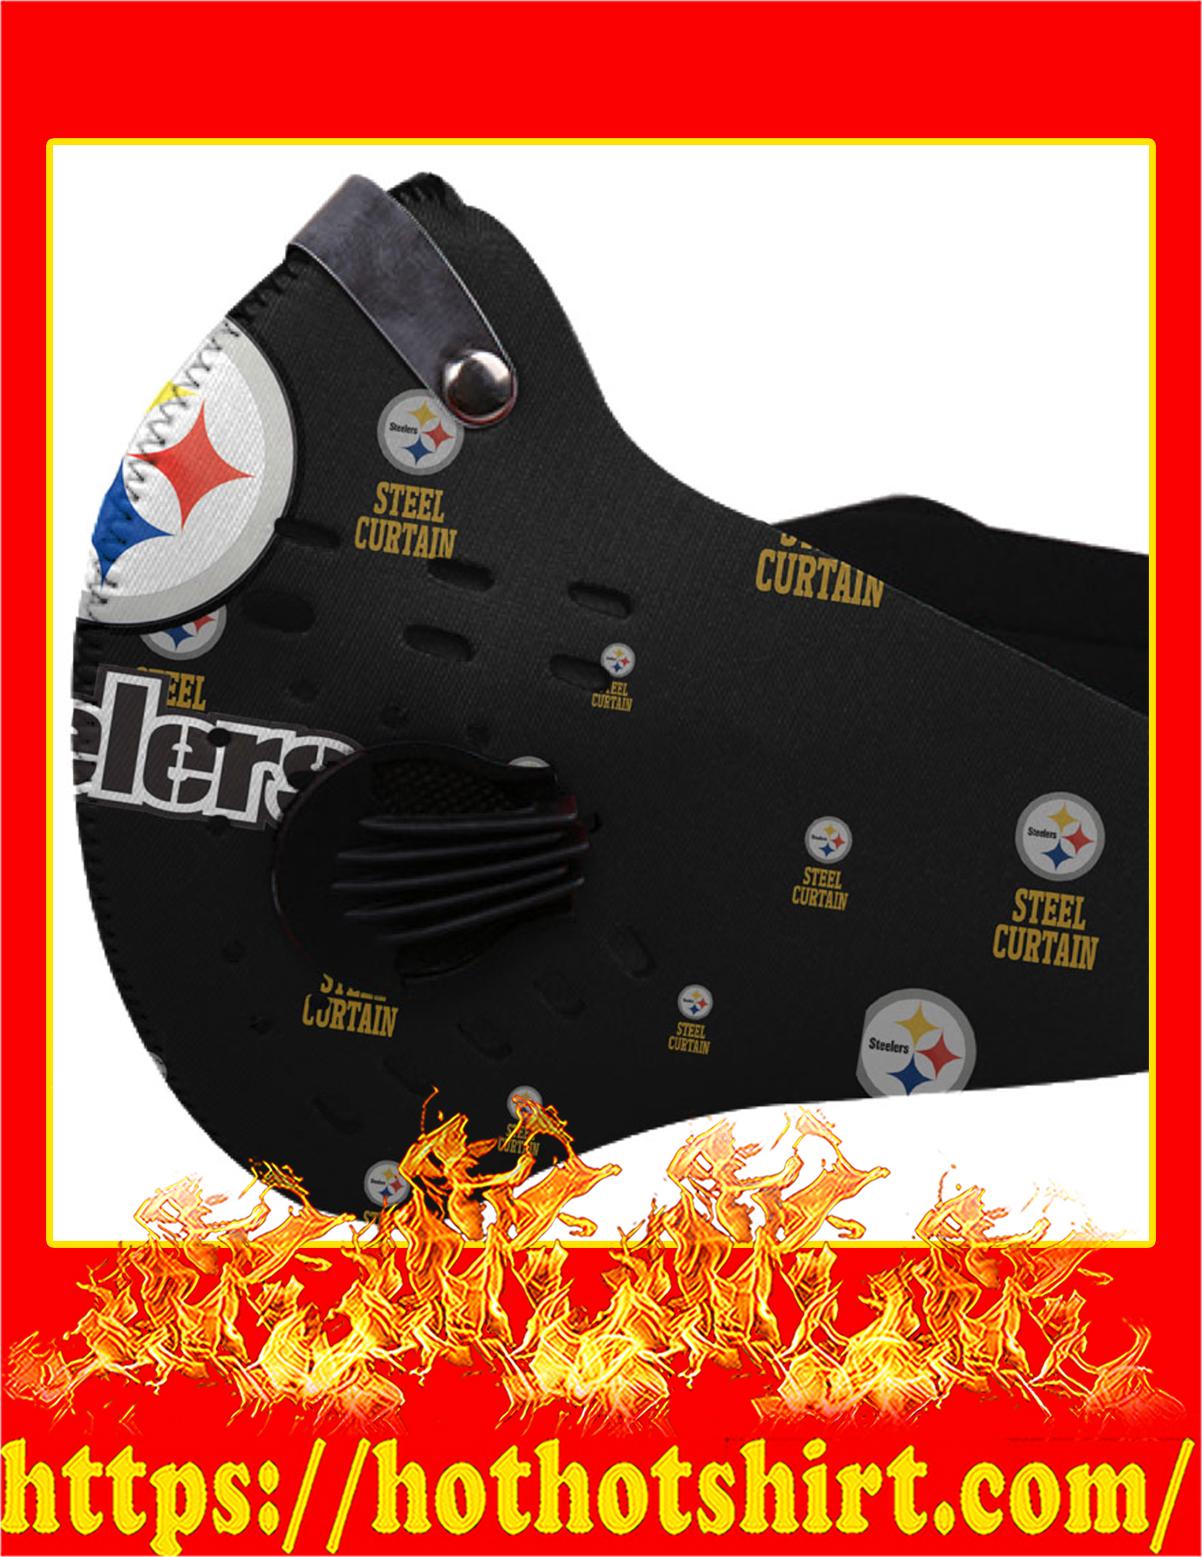 NFL steelers logo filter face mask - Pic 1